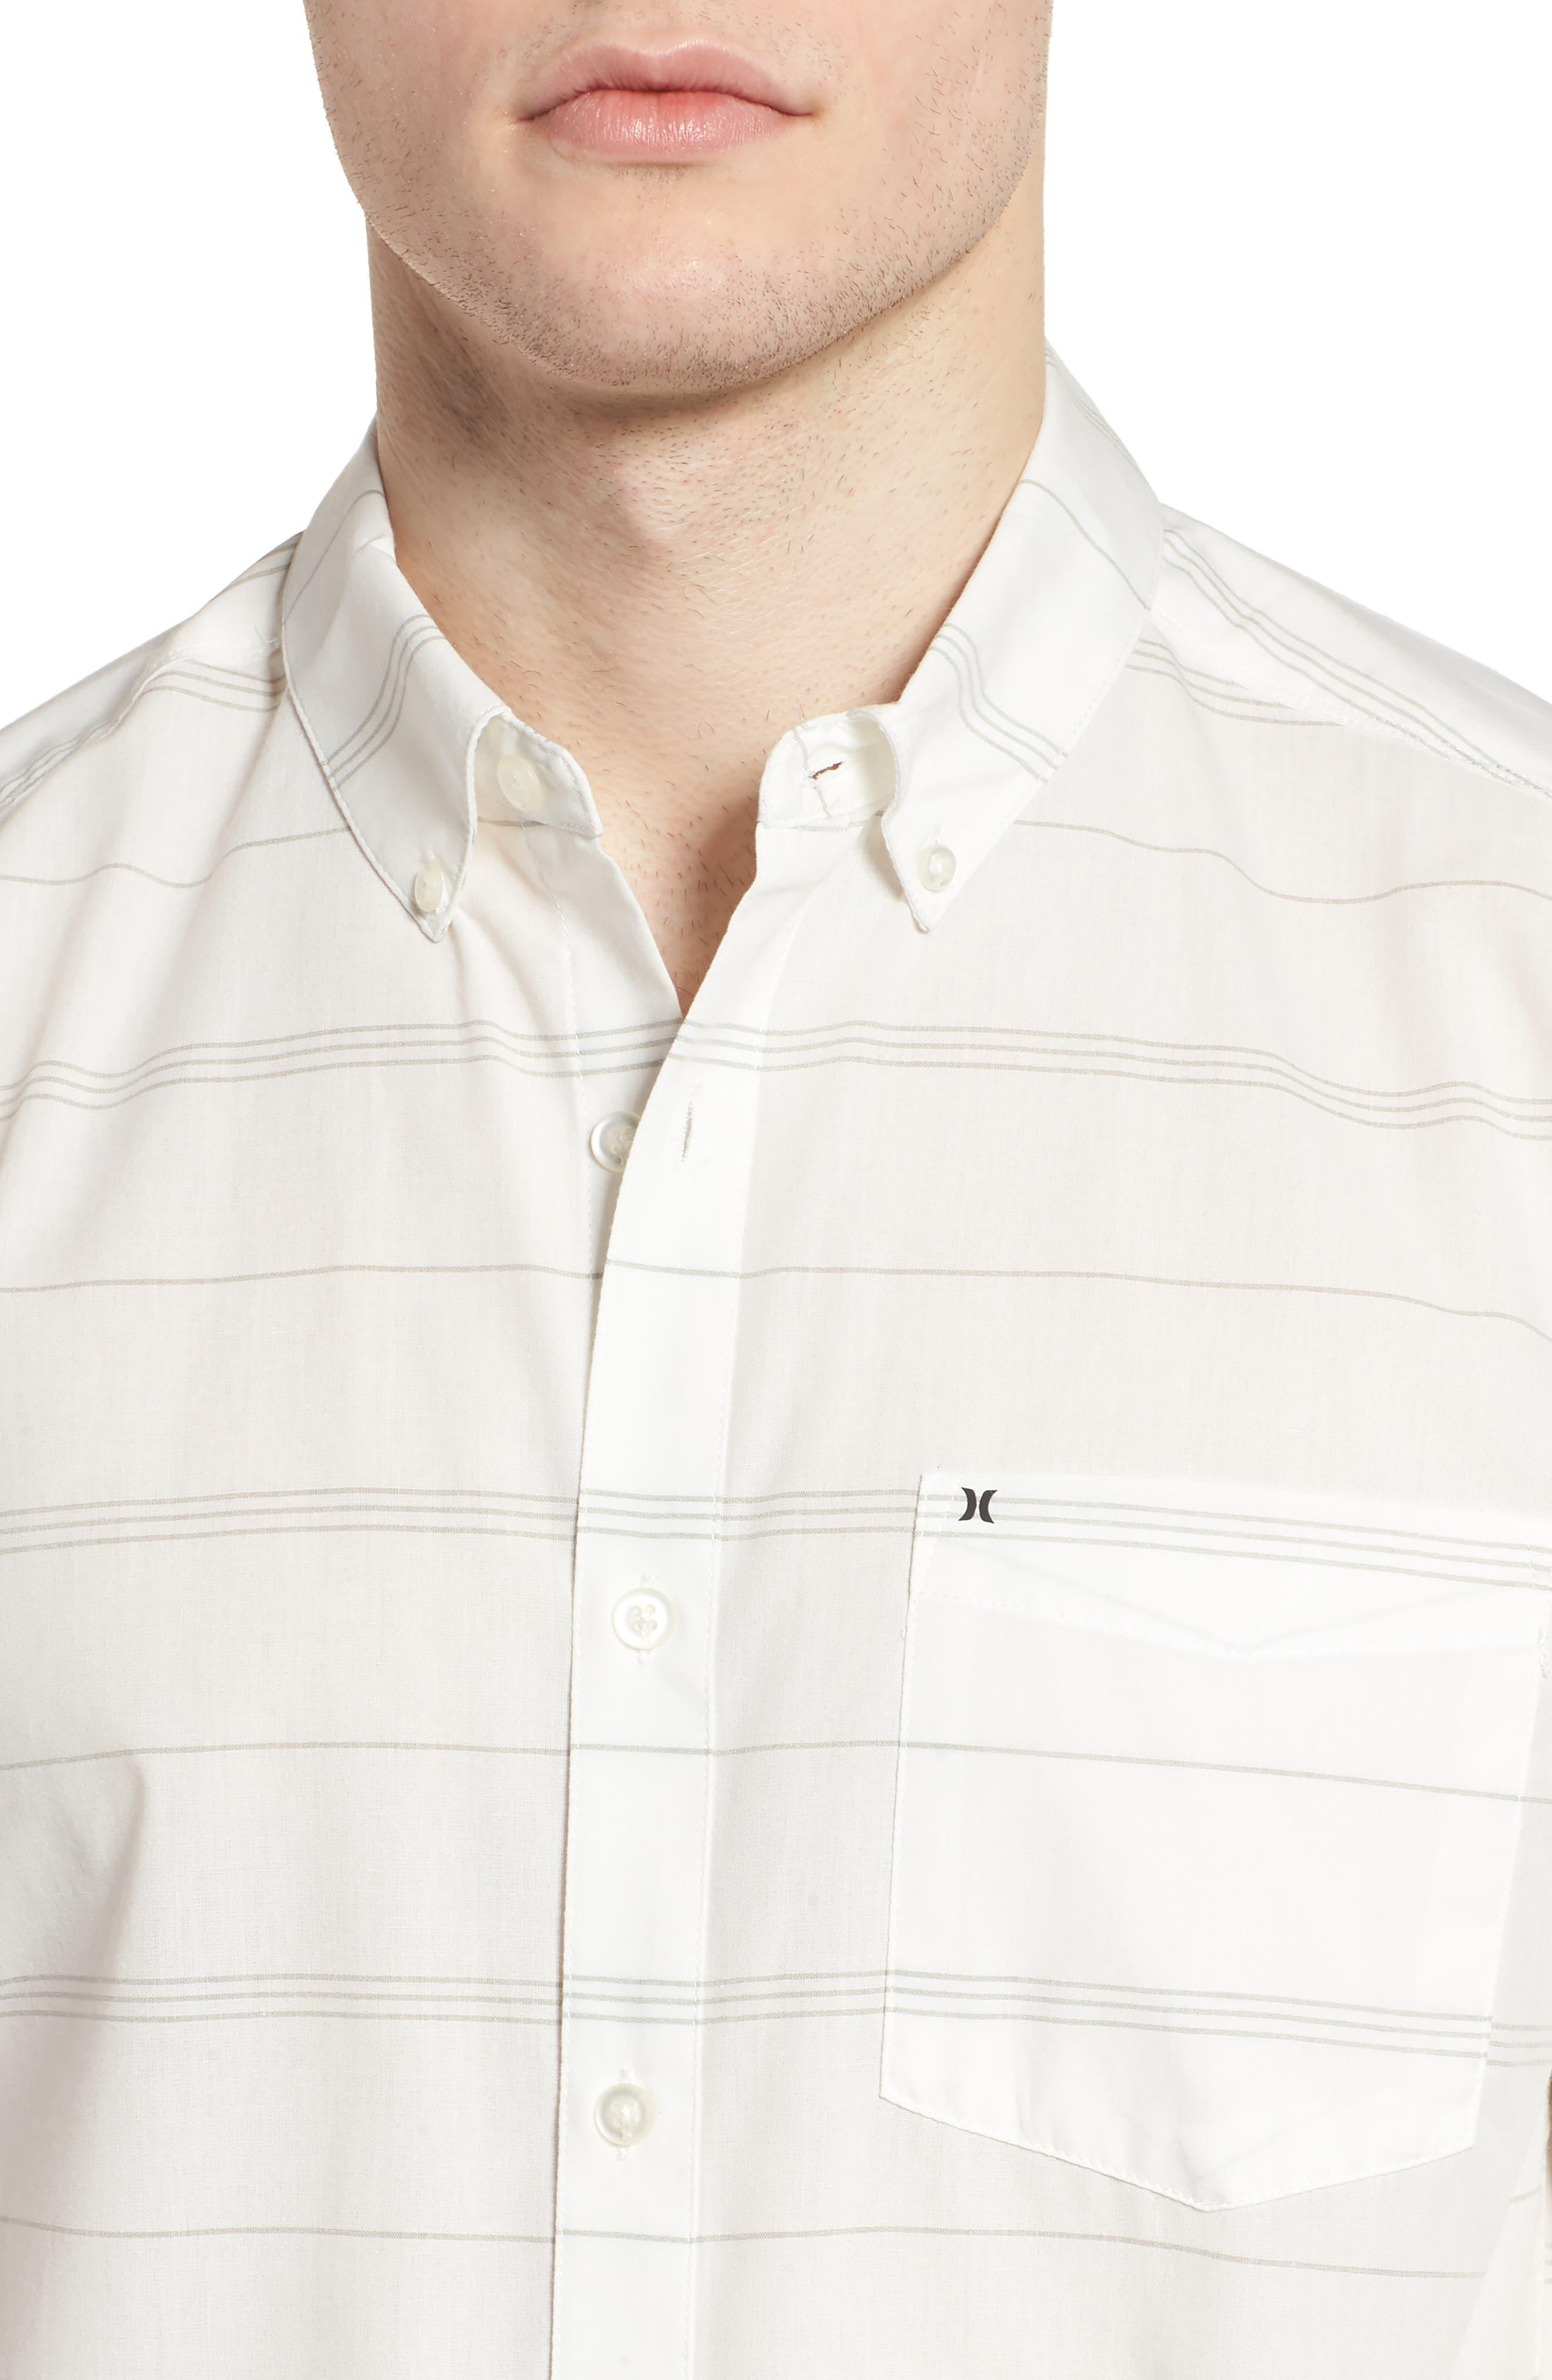 Dri-FIT Rhythm Shirt,                             Alternate thumbnail 2, color,                             Sail